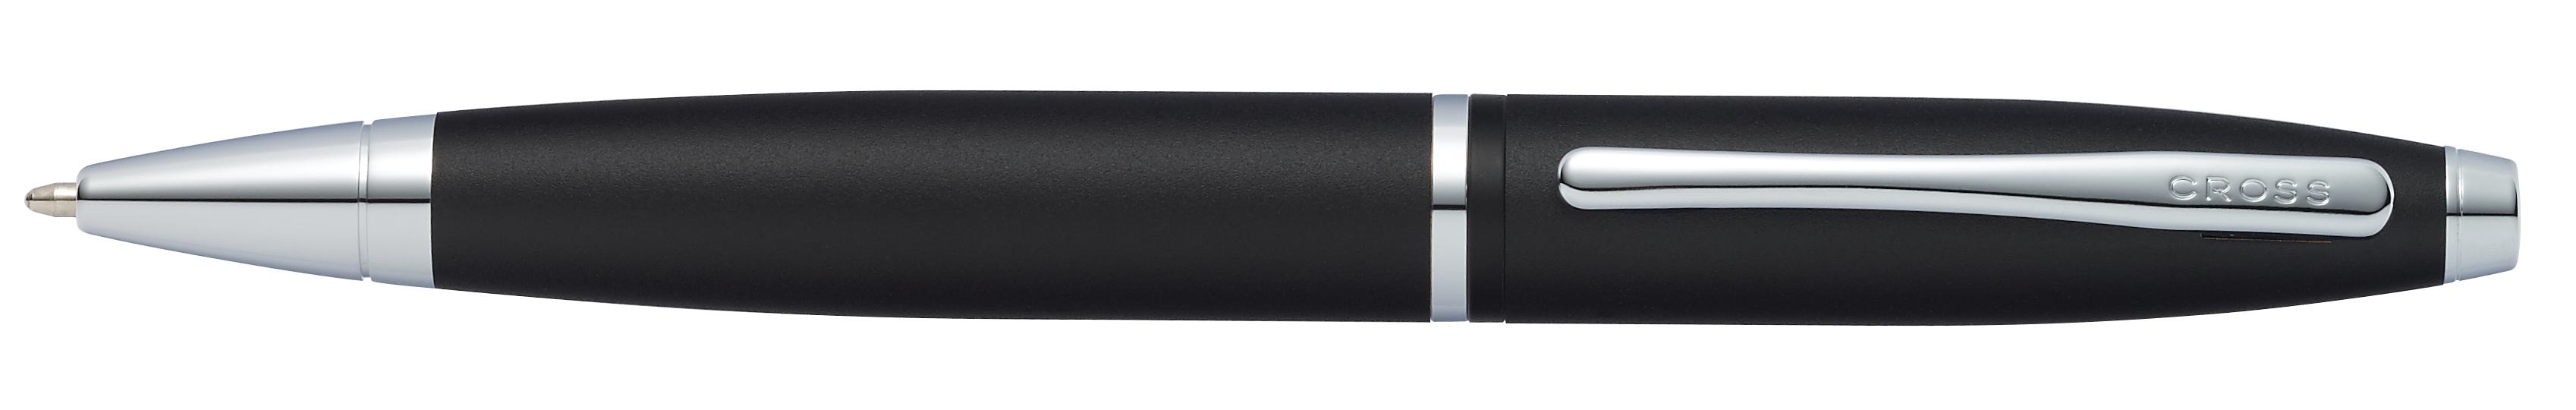 Calais Matte Black Ballpoint Pen